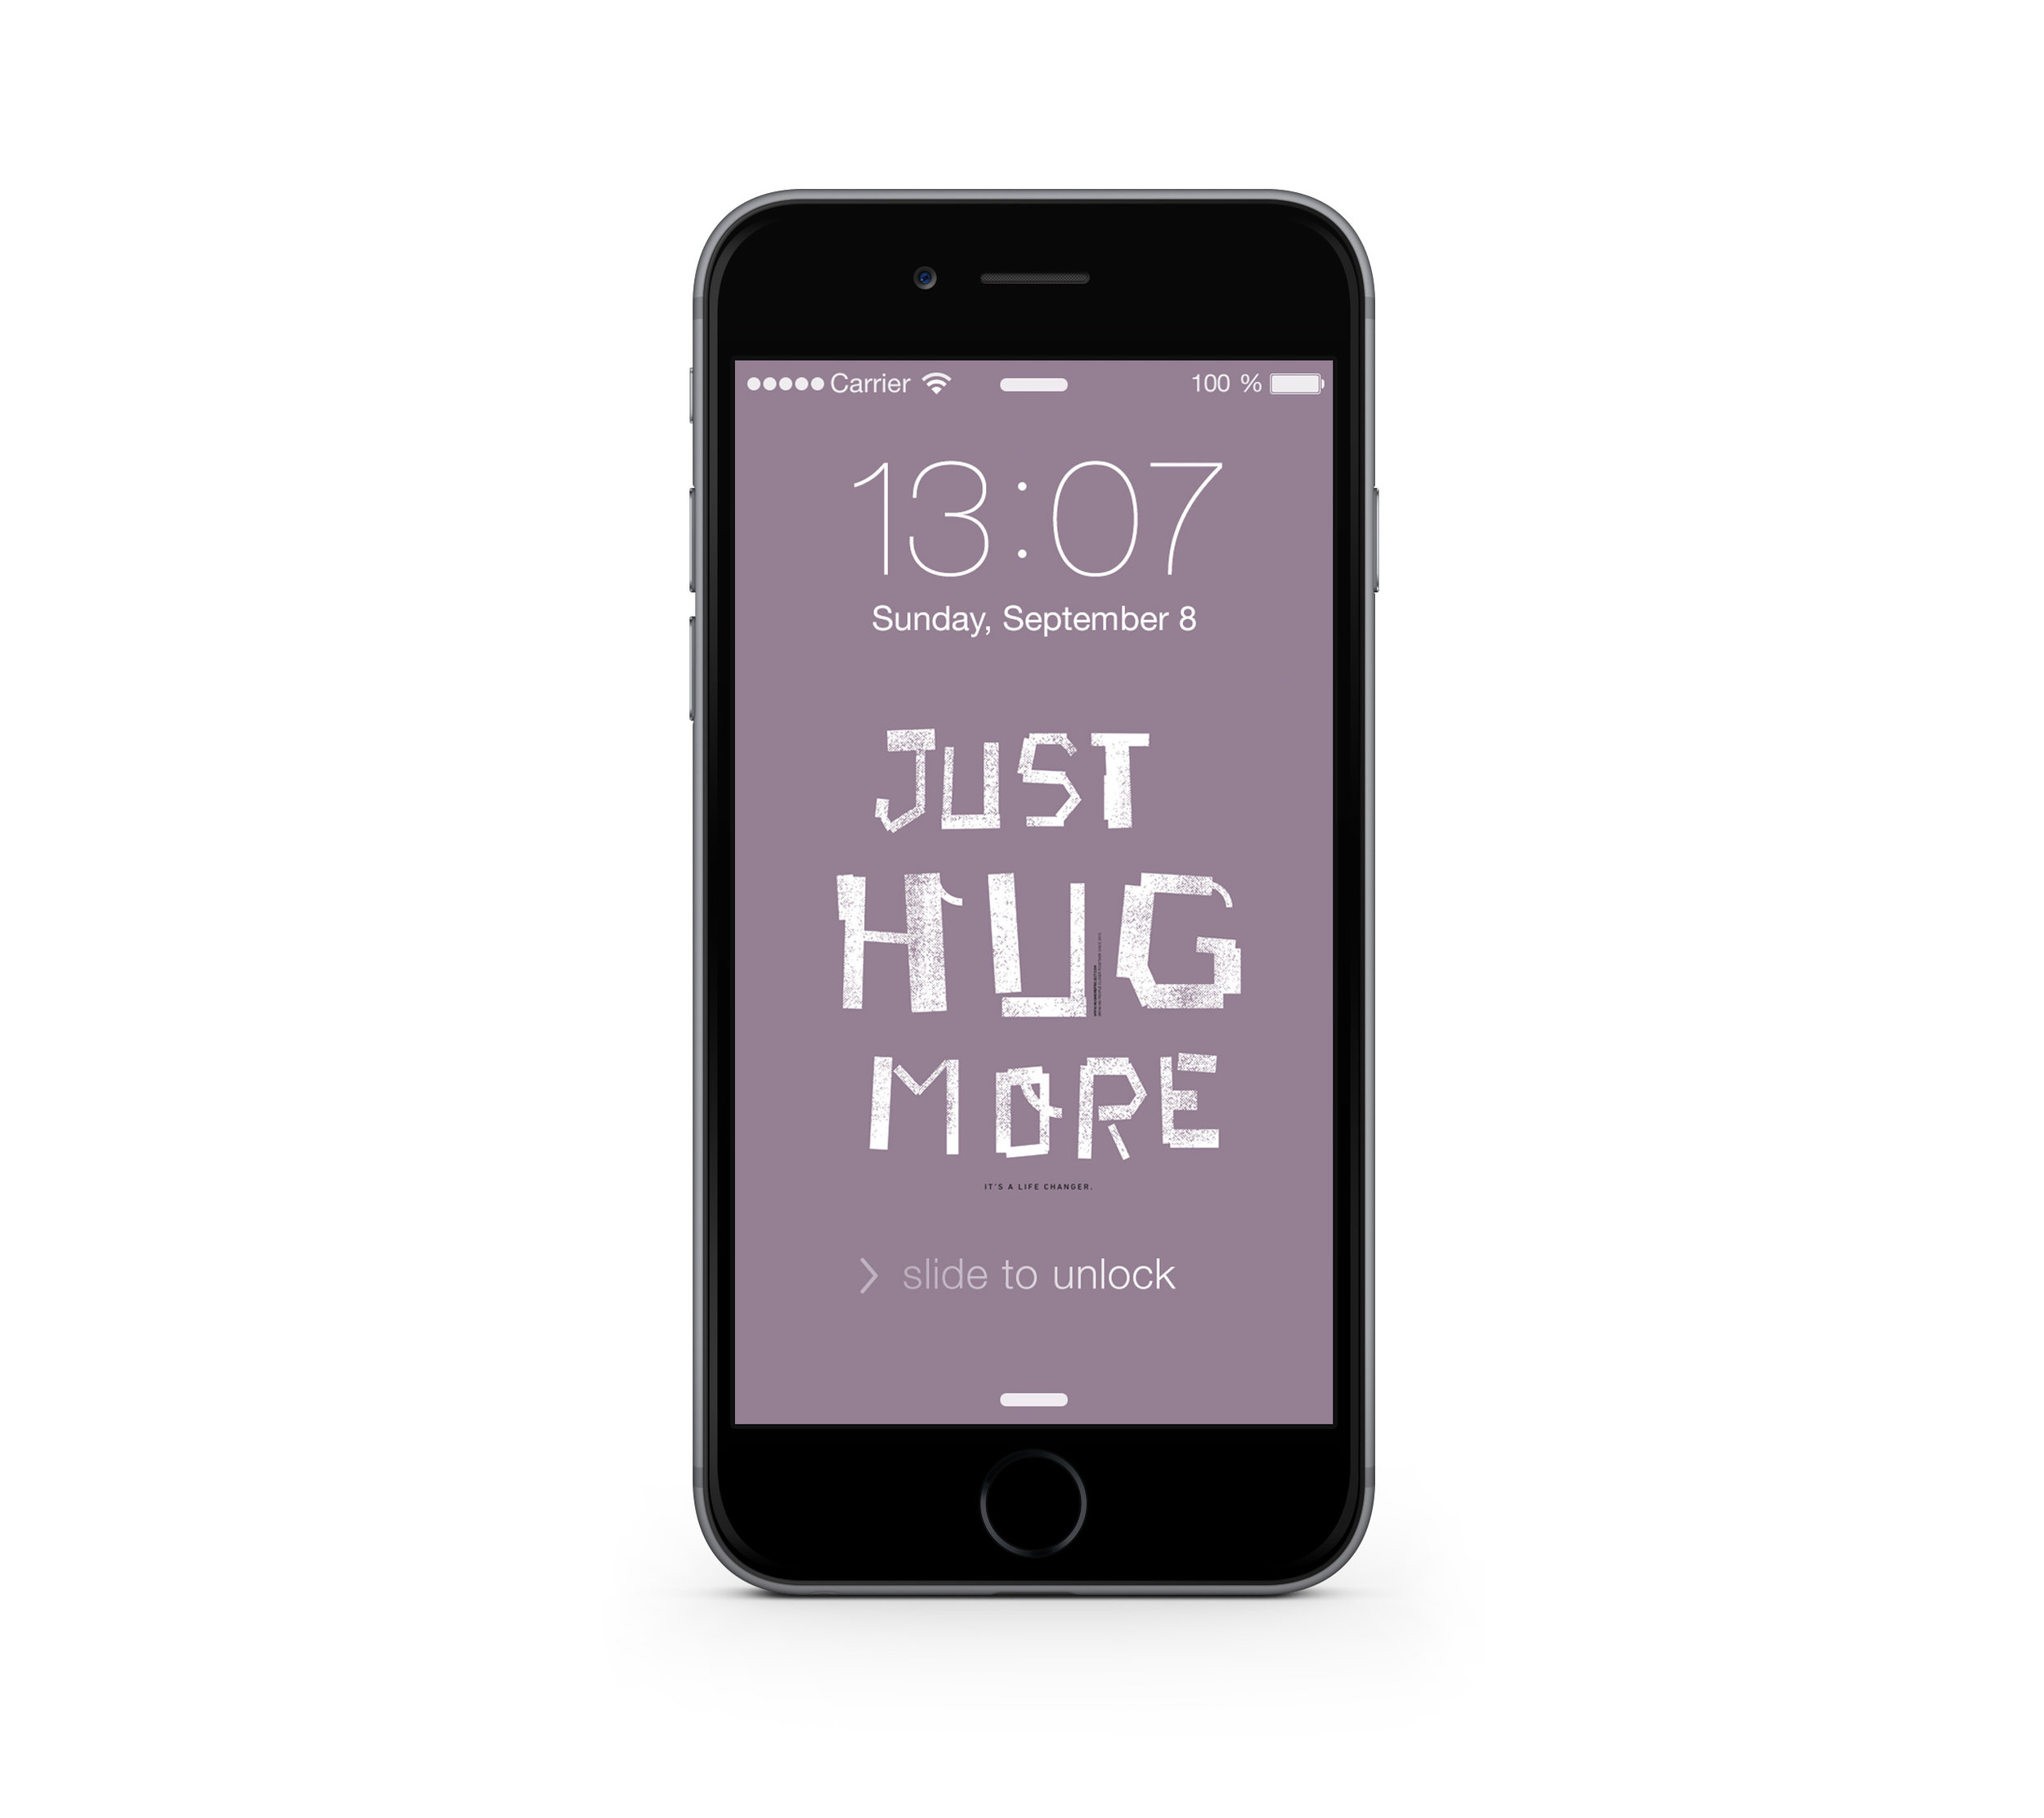 just-hug-more-typo-033-iPhone-mockup-onwhite.jpg